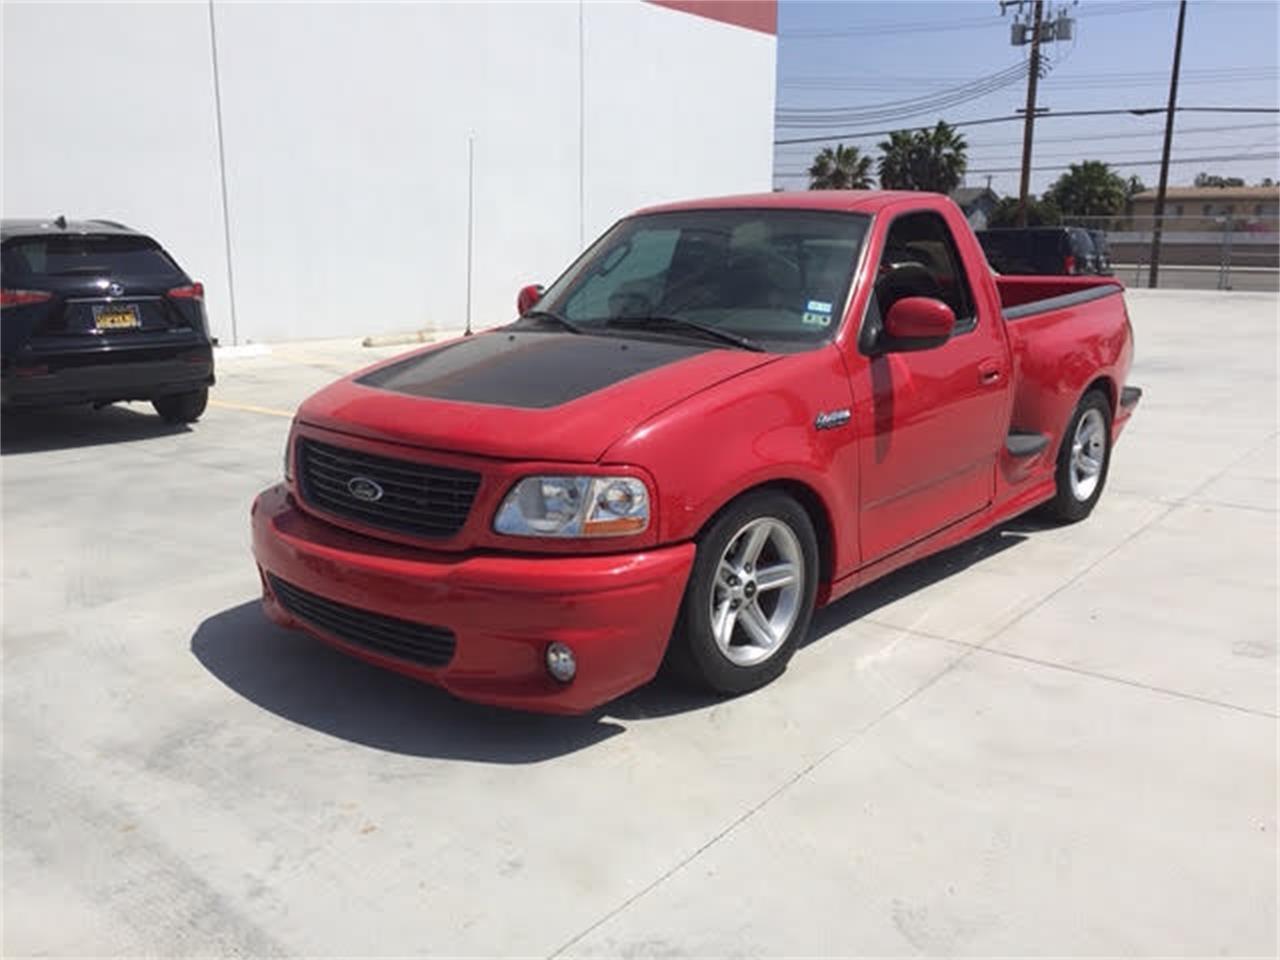 2004 Ford Lightning For Sale >> 2004 Ford Lightning For Sale Classiccars Com Cc 1224042